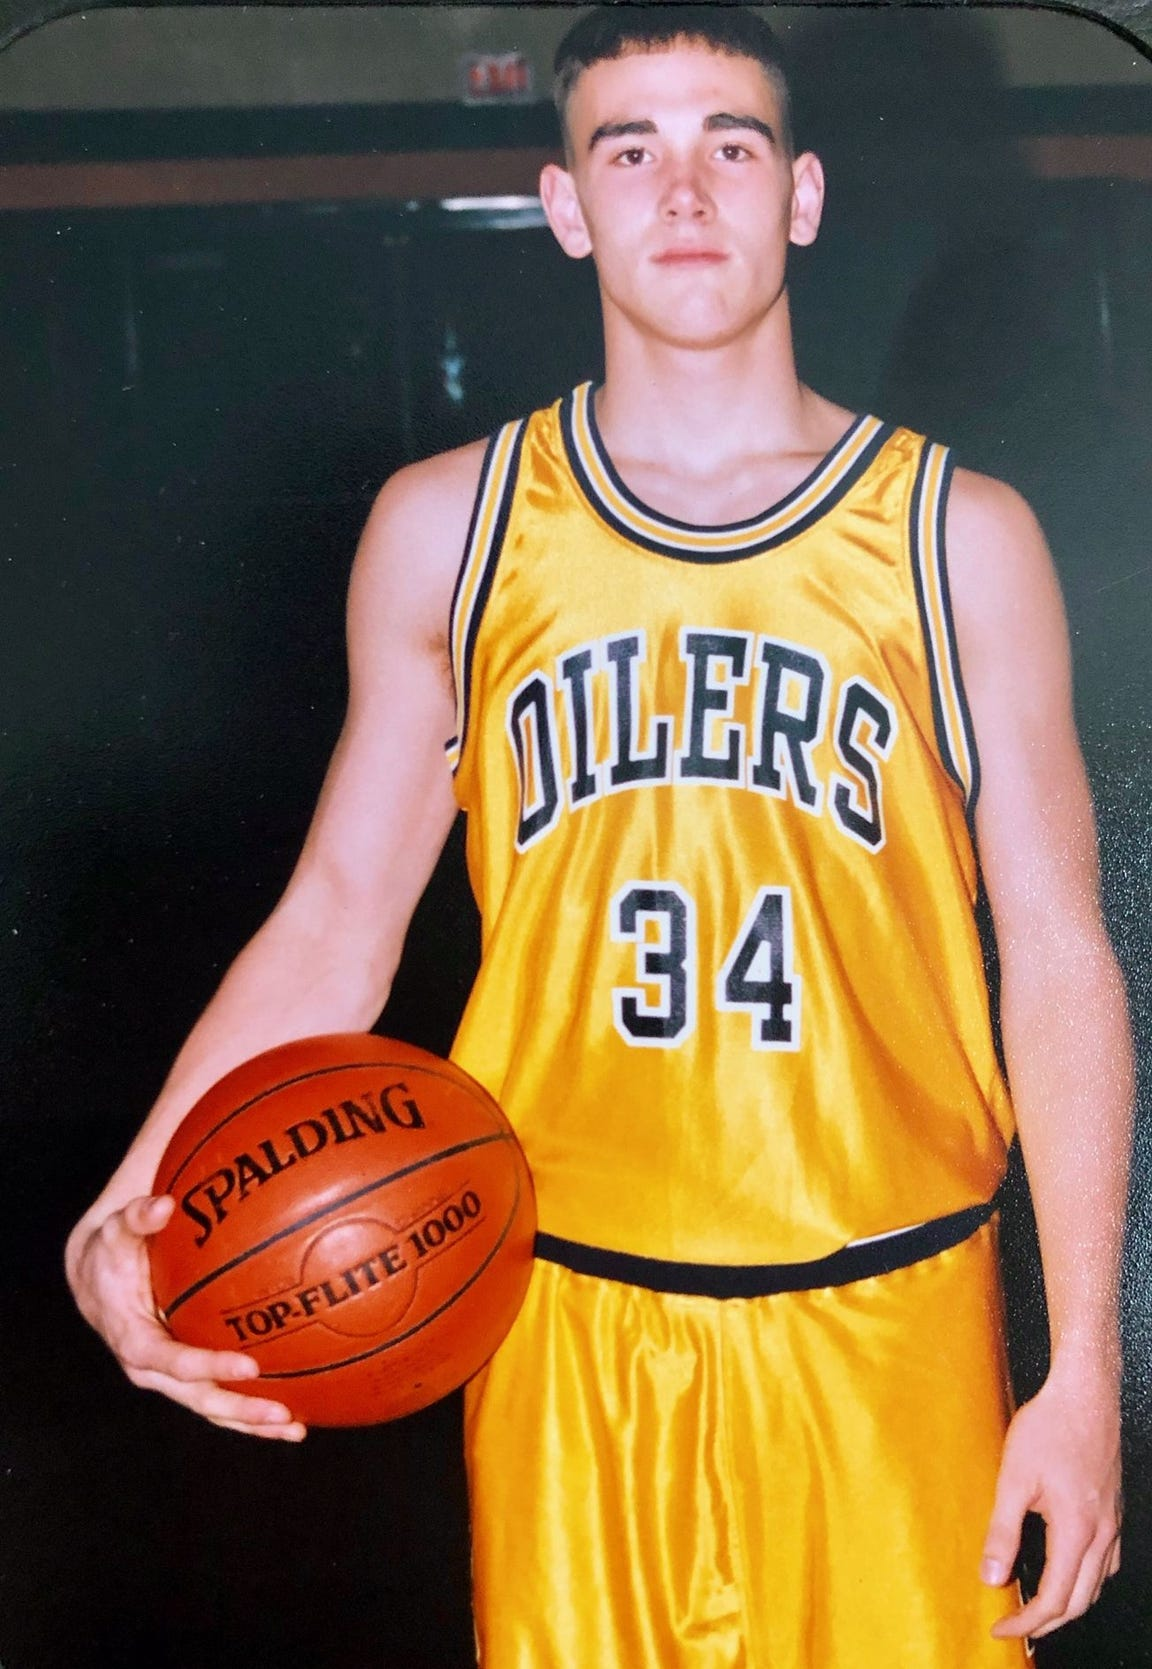 Matt LaFleur played basketball at Mount Pleasant High School.